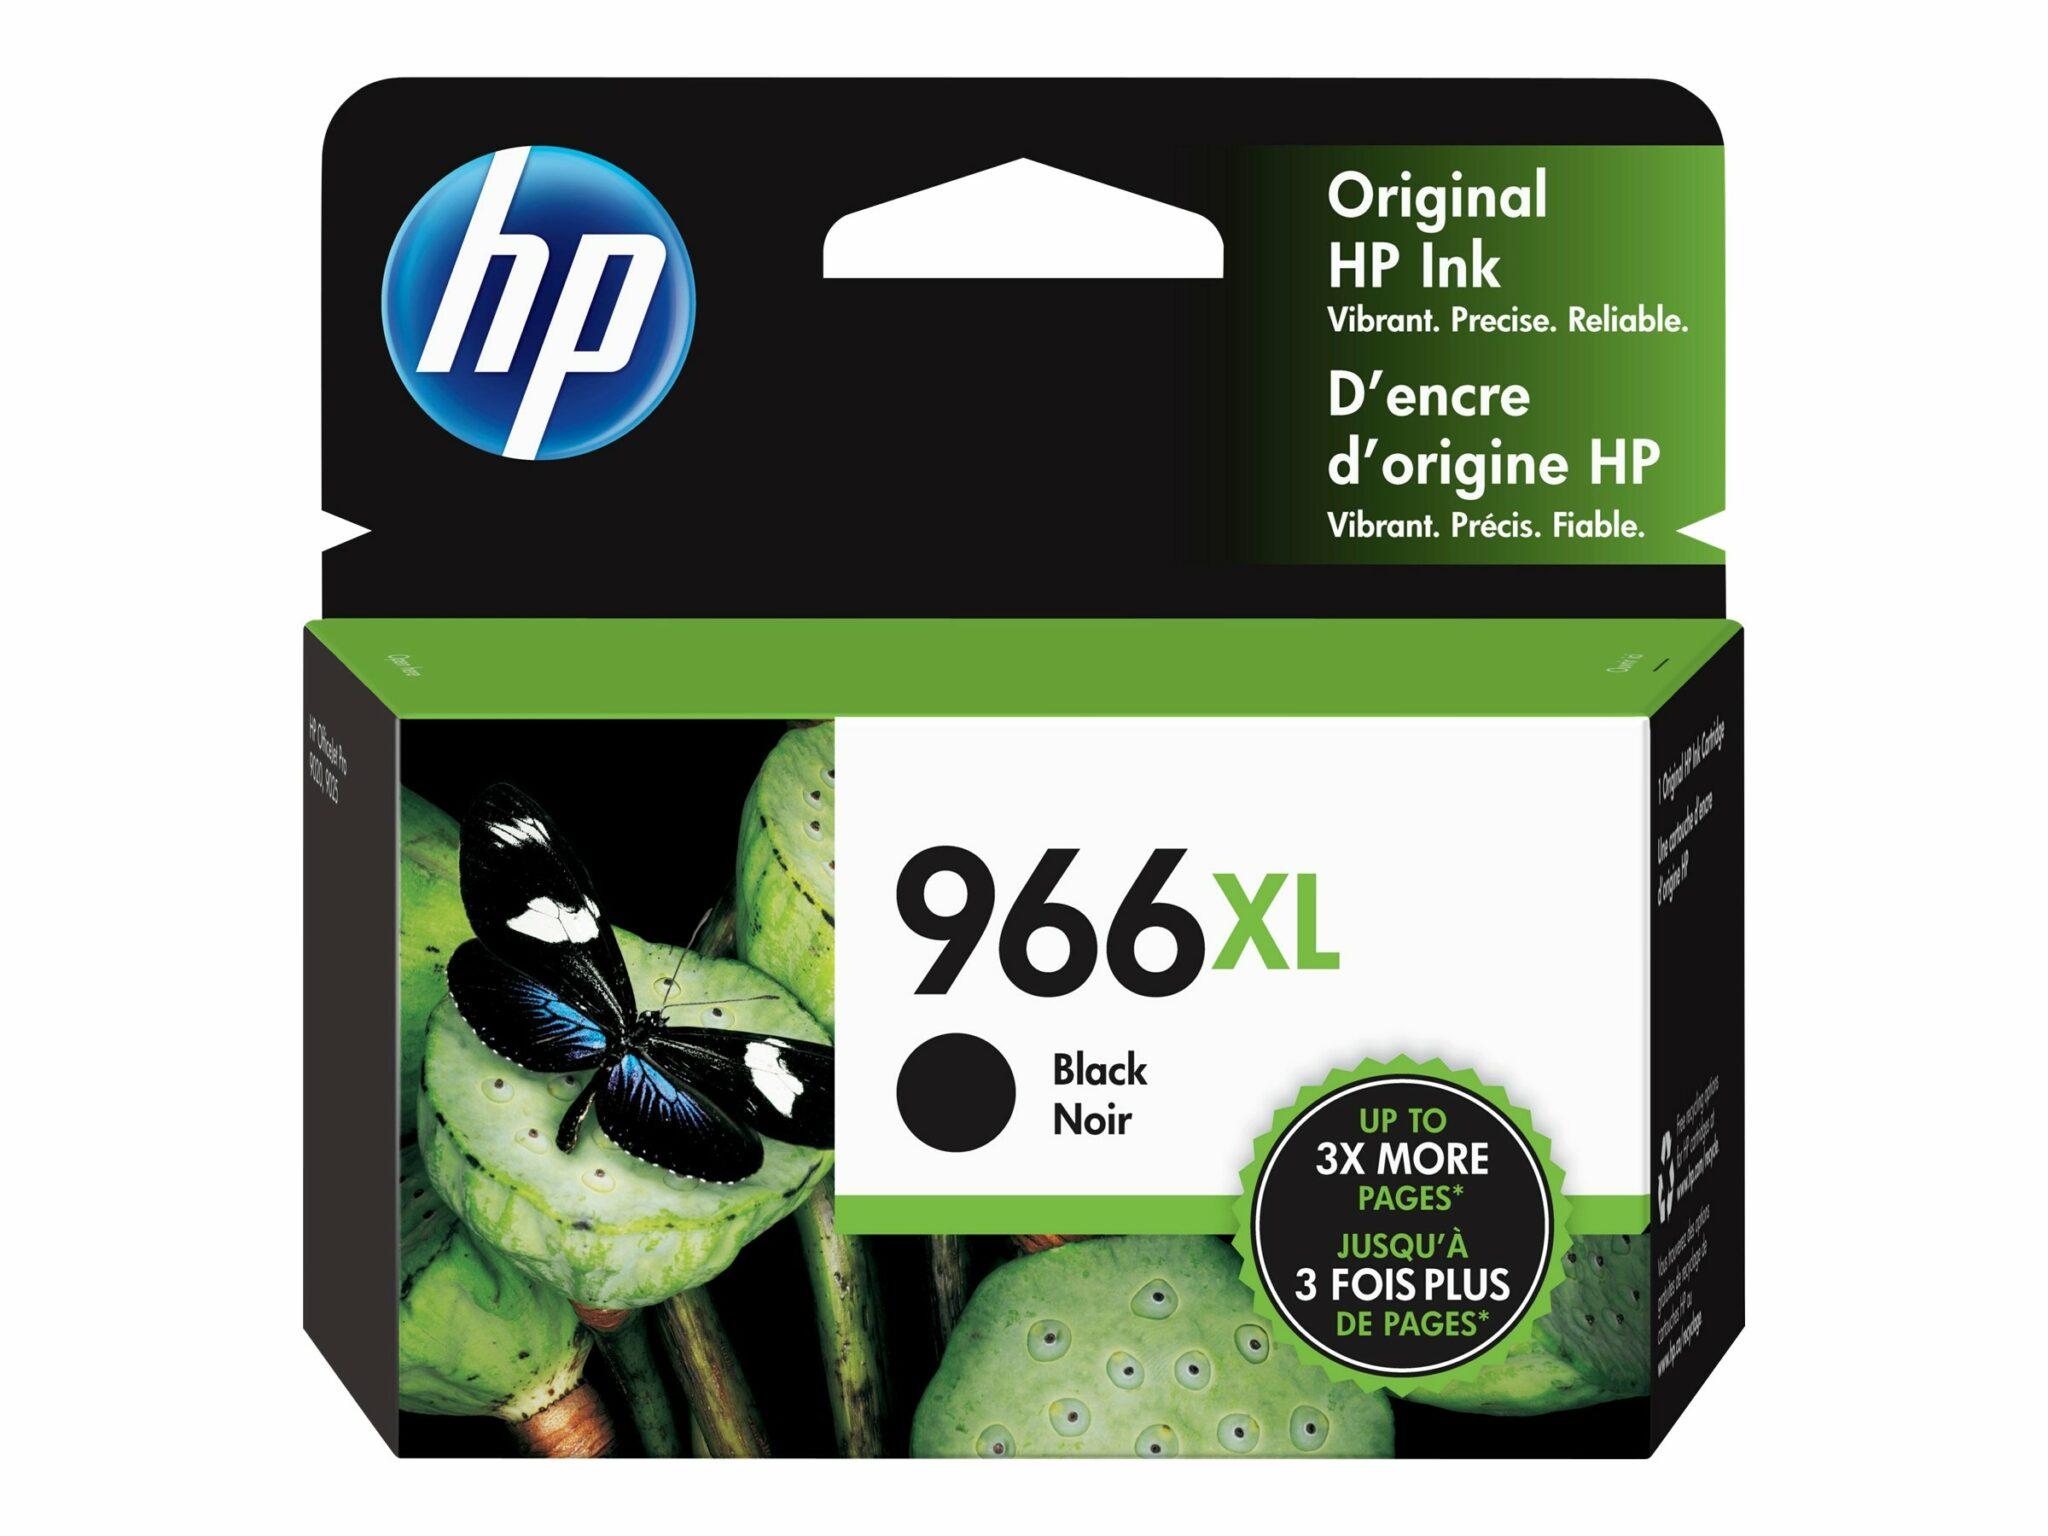 HP 966XL Black Original Ink Cartridge